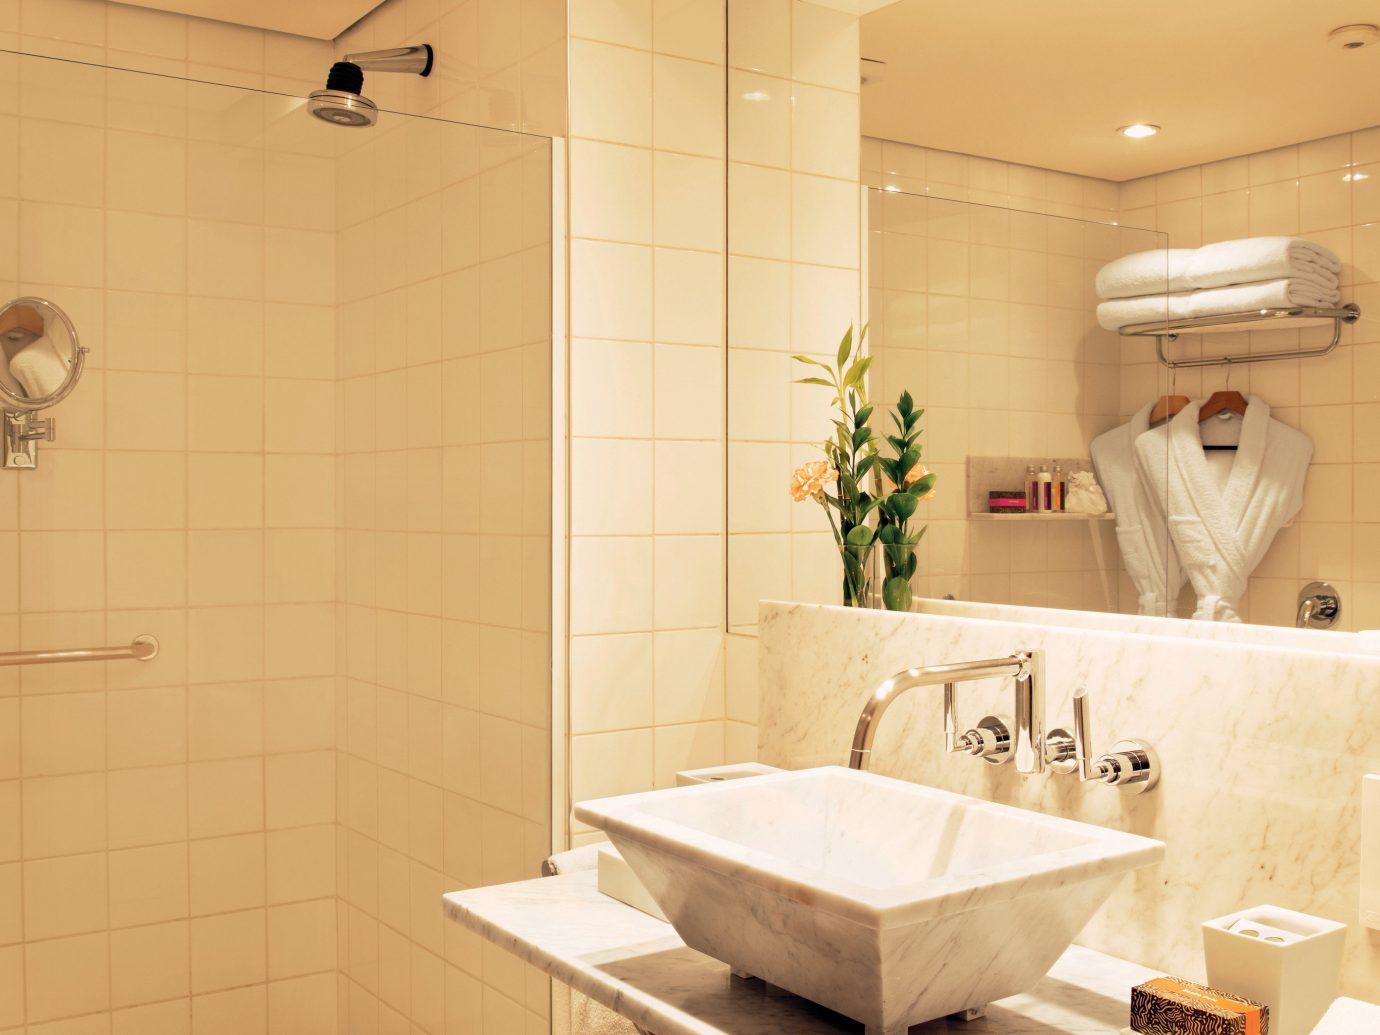 Hotels wall indoor bathroom room tile interior design floor plumbing fixture flooring sink vessel product design ceiling tap ceramic interior designer toilet public water basin tiled